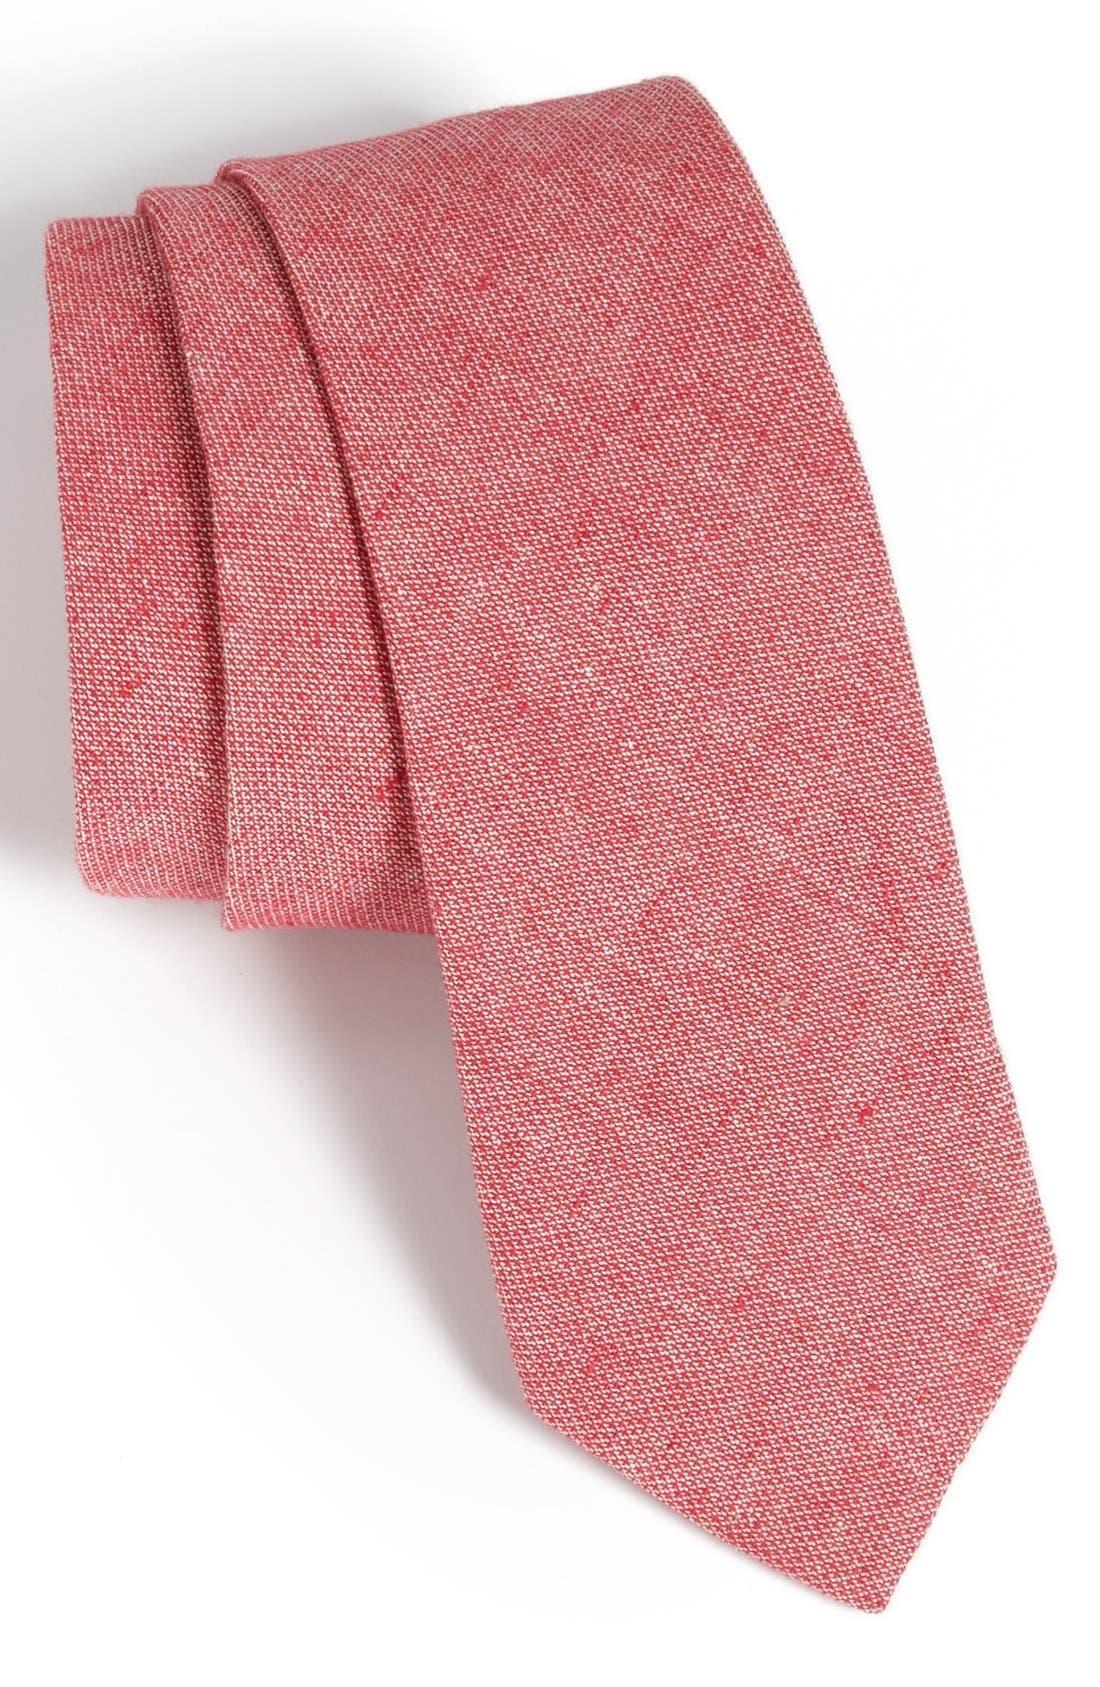 Main Image - Topman Chambray Tie